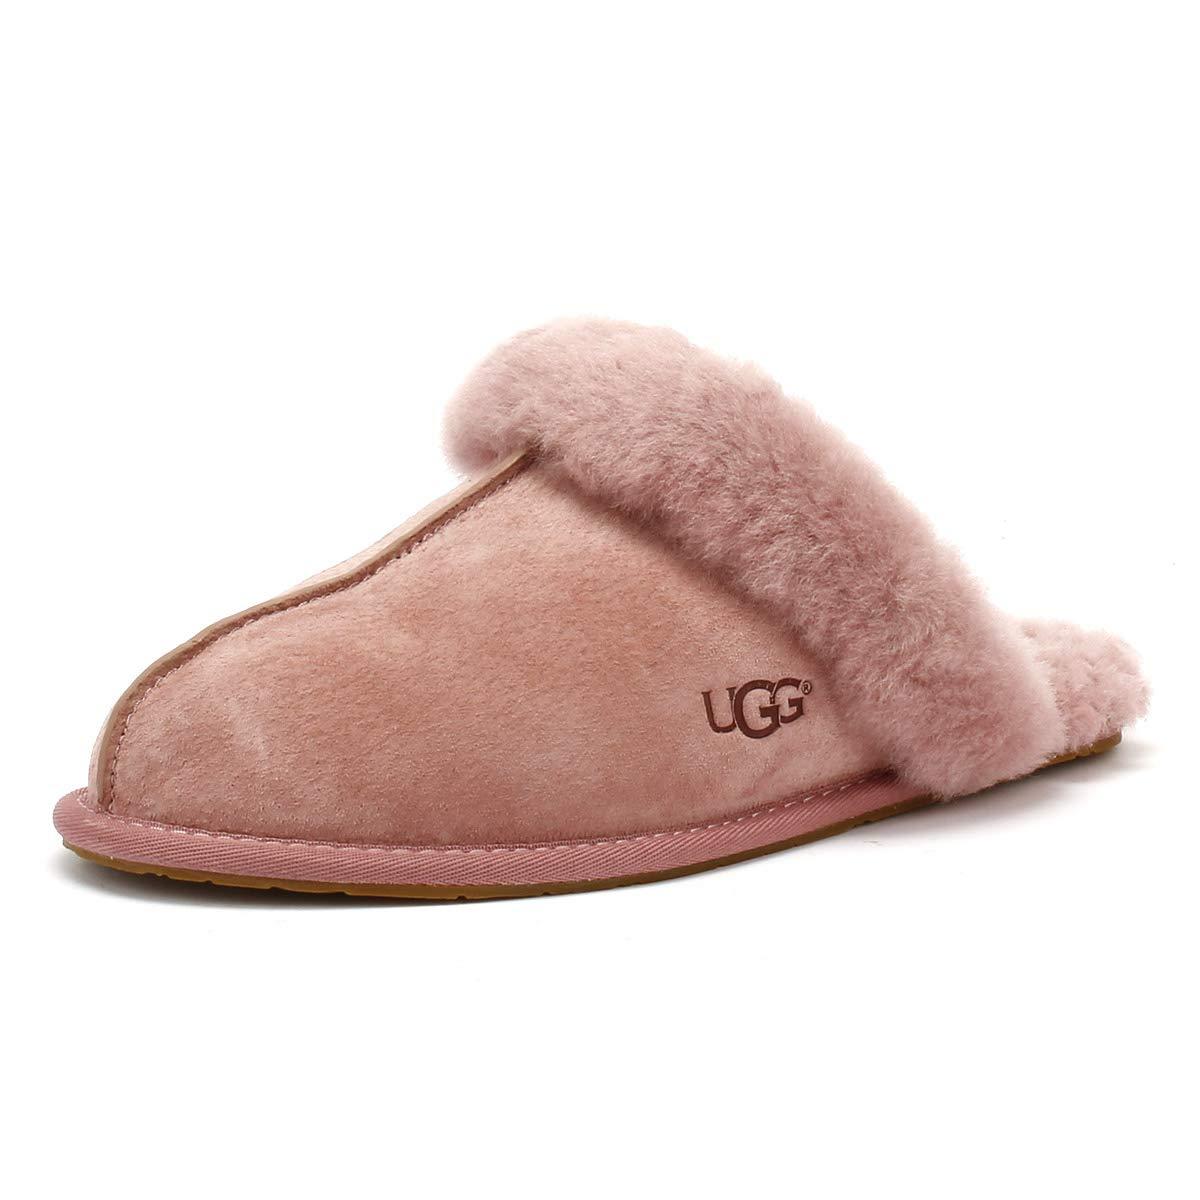 2cad31c3ae5 UGG - Scuffette II 5661 Pink Dawn